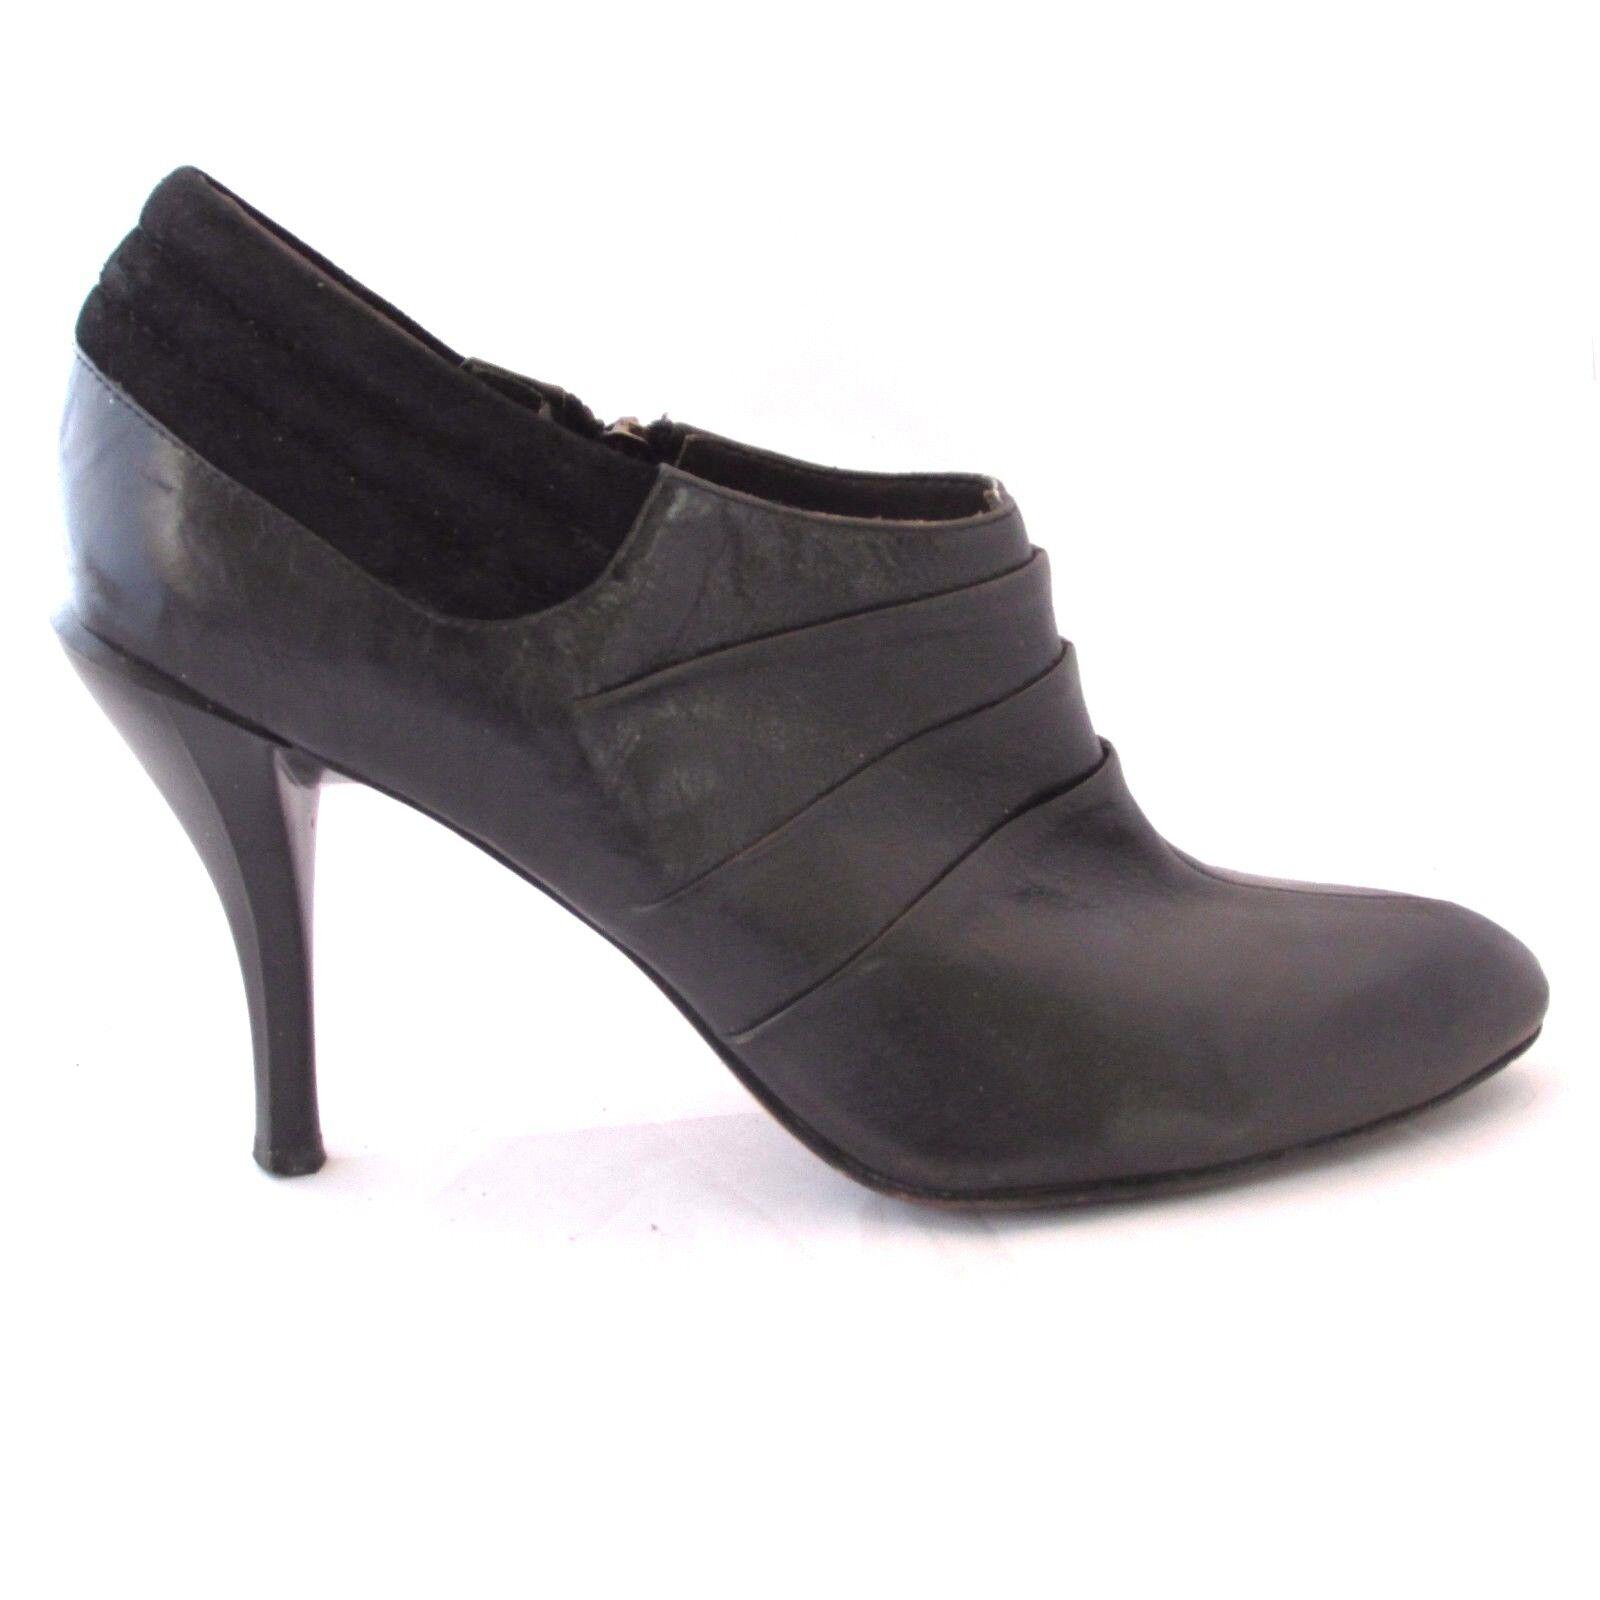 Vero Cuoio Black High Heel Heel Heel shoes Boot Side Zipper 'Modern Vintage' Size 8 Eu 38.5 ca6daf